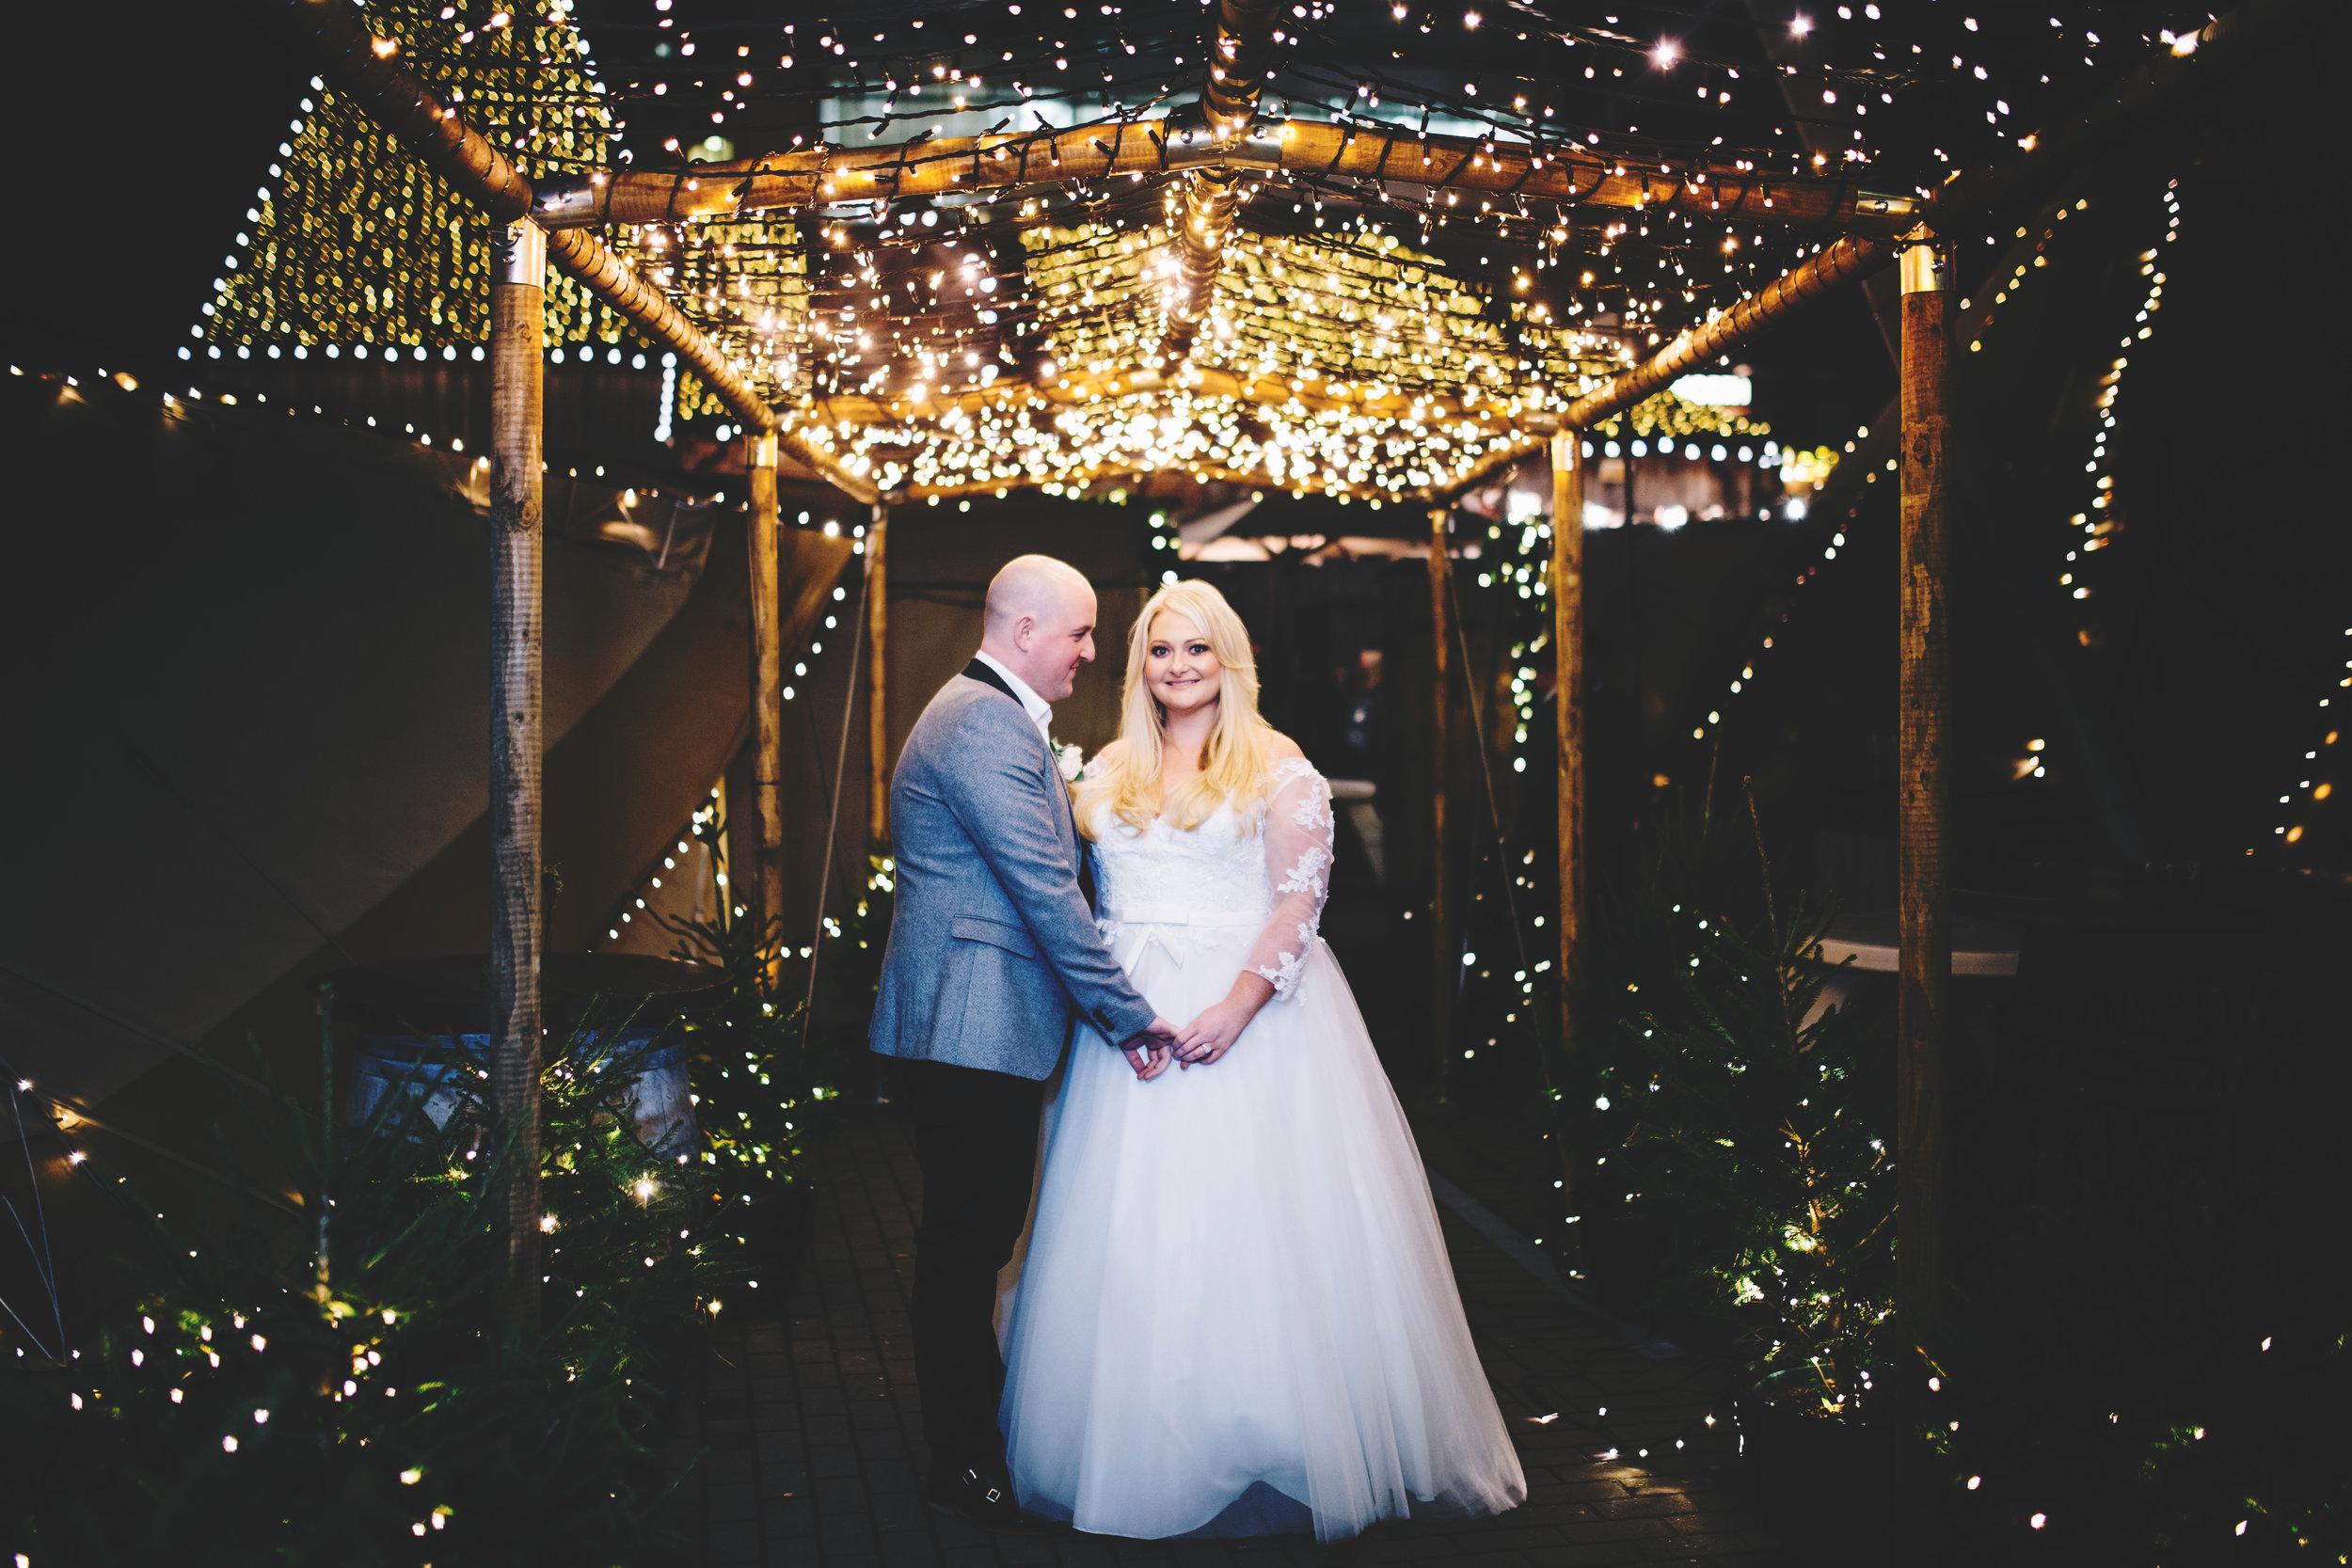 creative winter wedding pictures